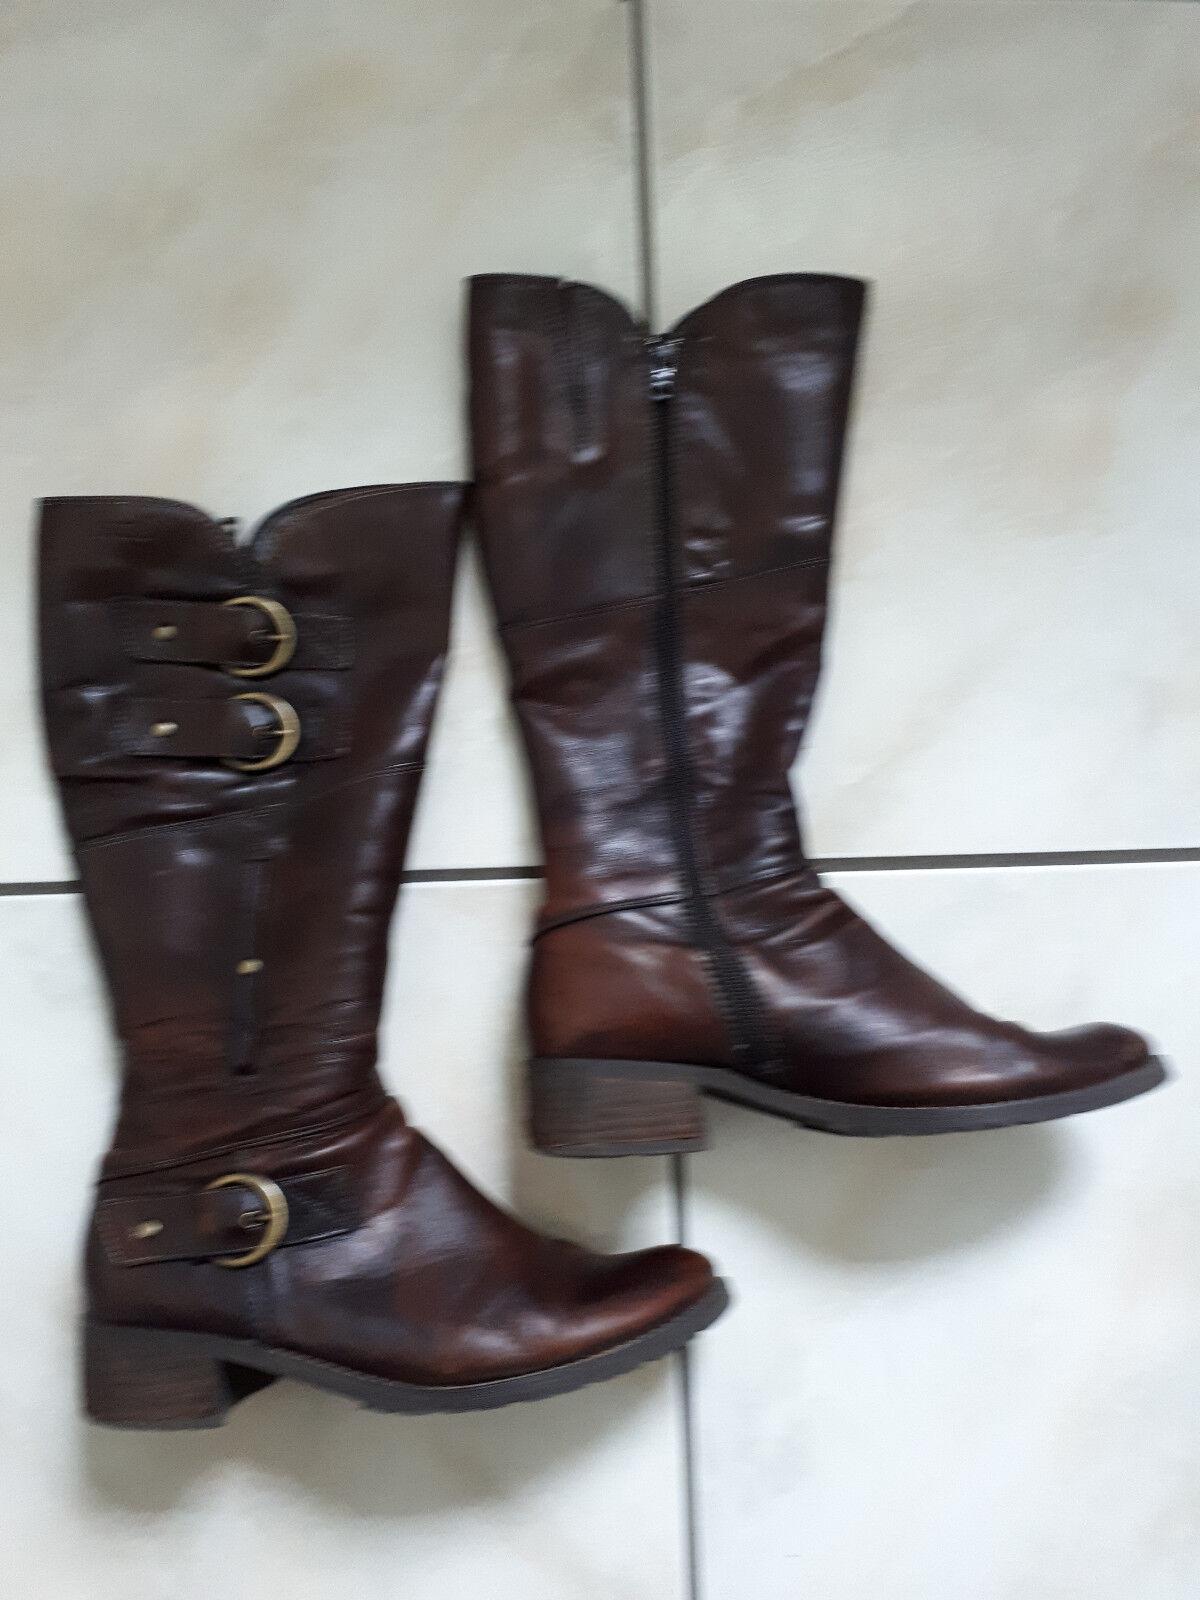 Damen Stiefel Bama Lederimitat Klassische Stiefel